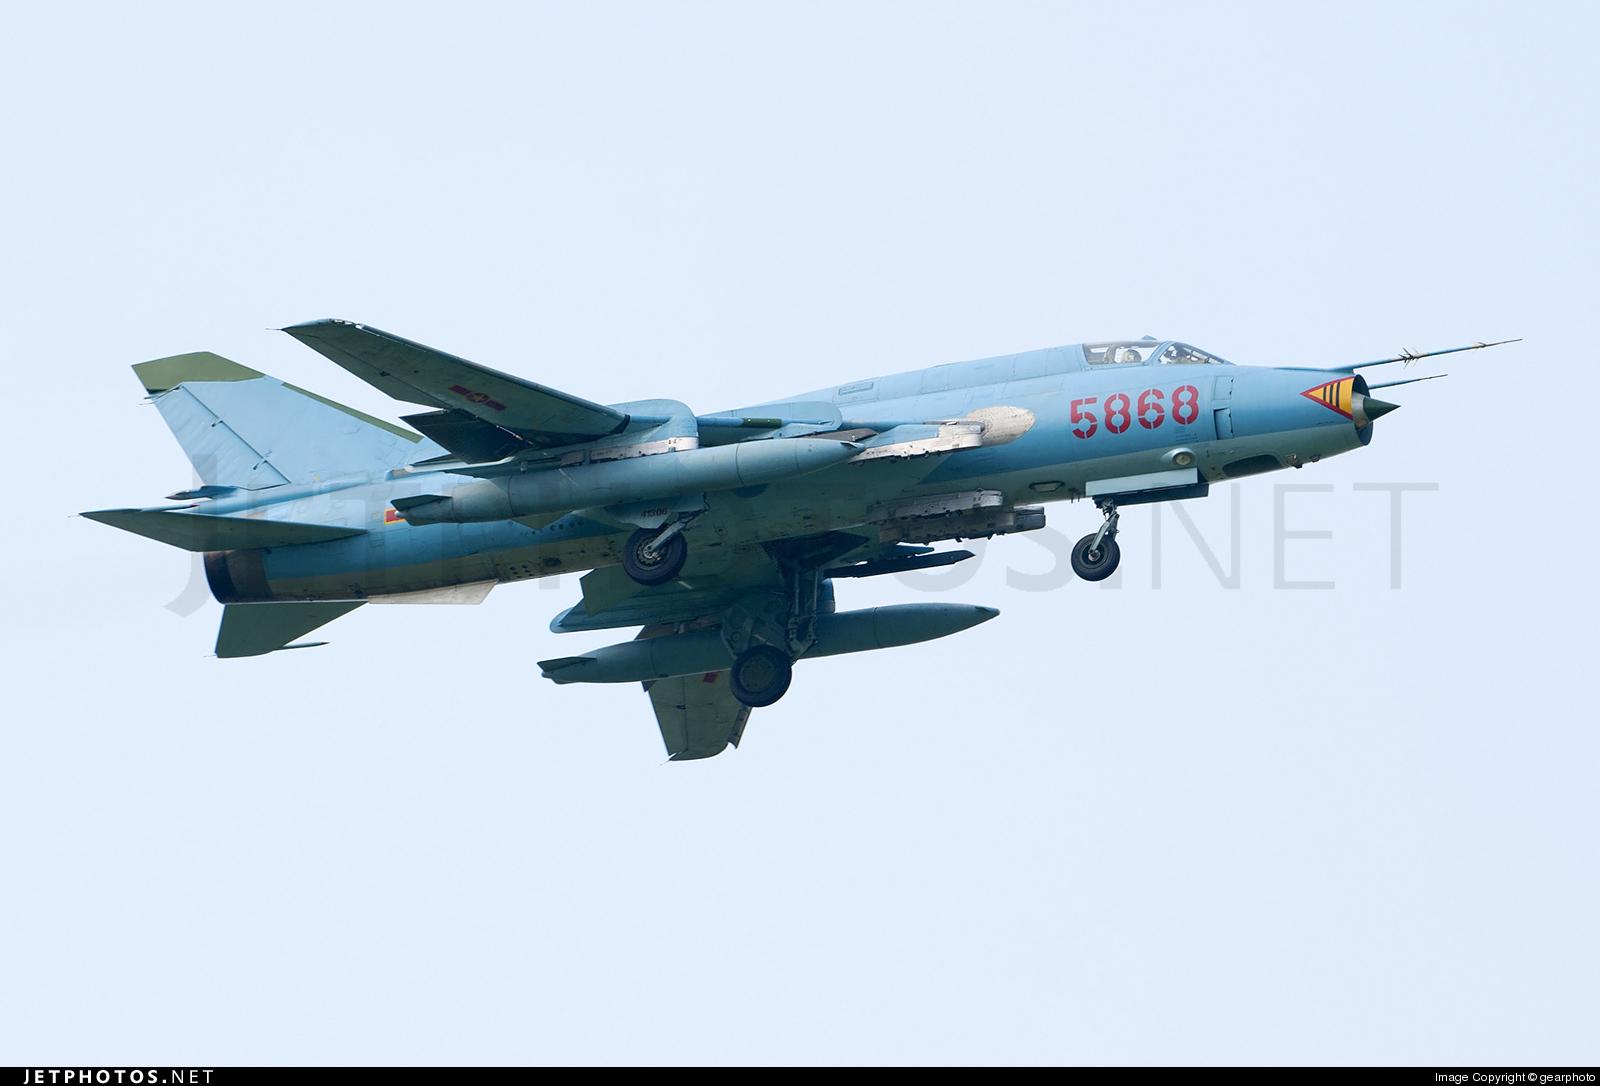 5868 - Sukhoi Su-22M4 Fitter K - Vietnam - Air Force